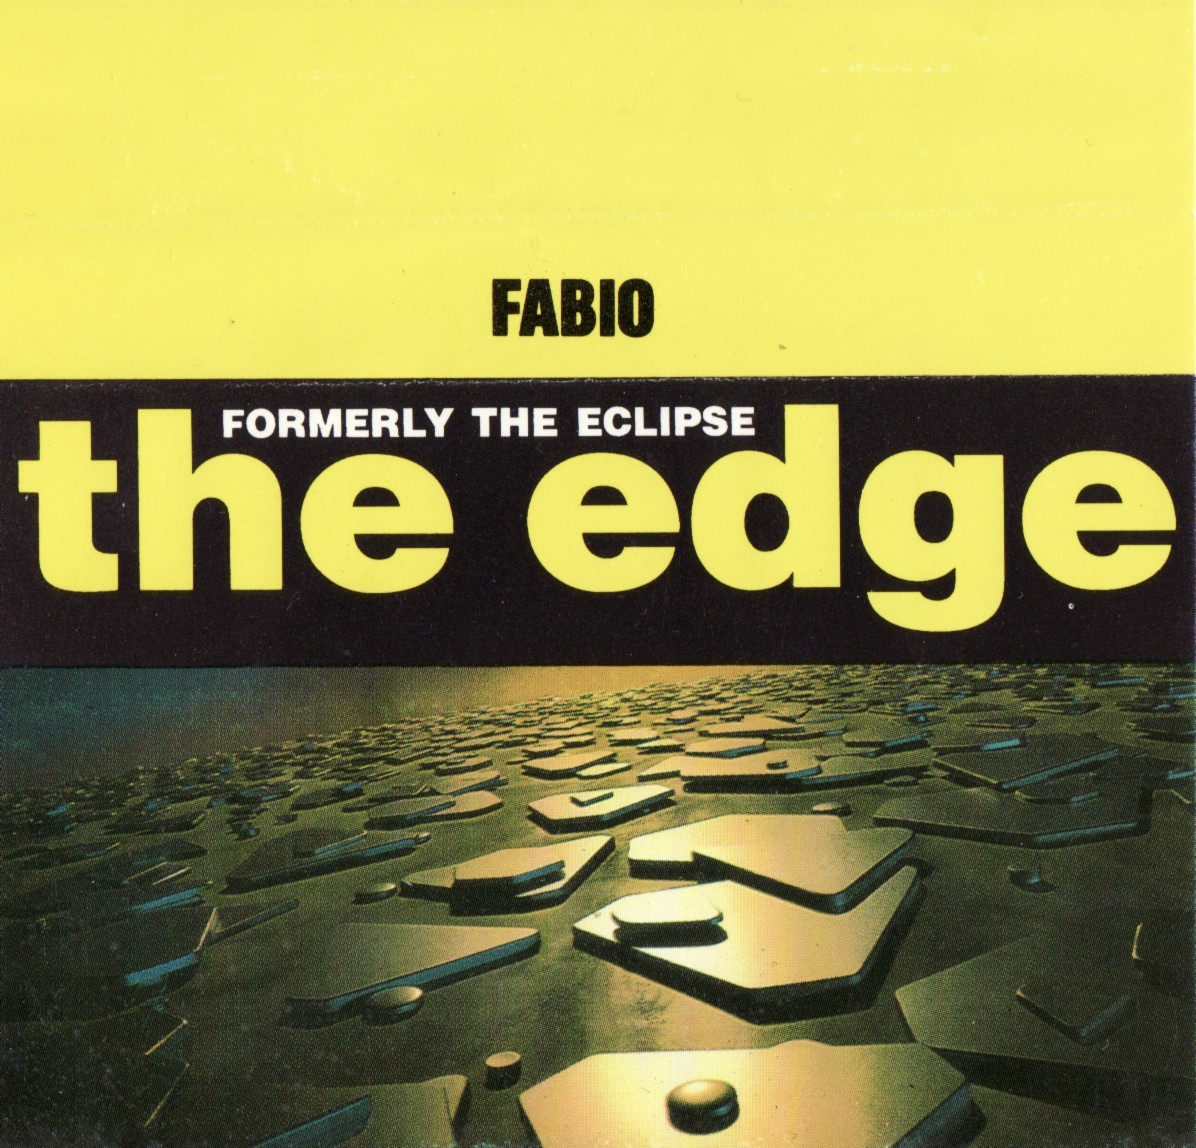 Fabio - The Edge - 2nd October 1992